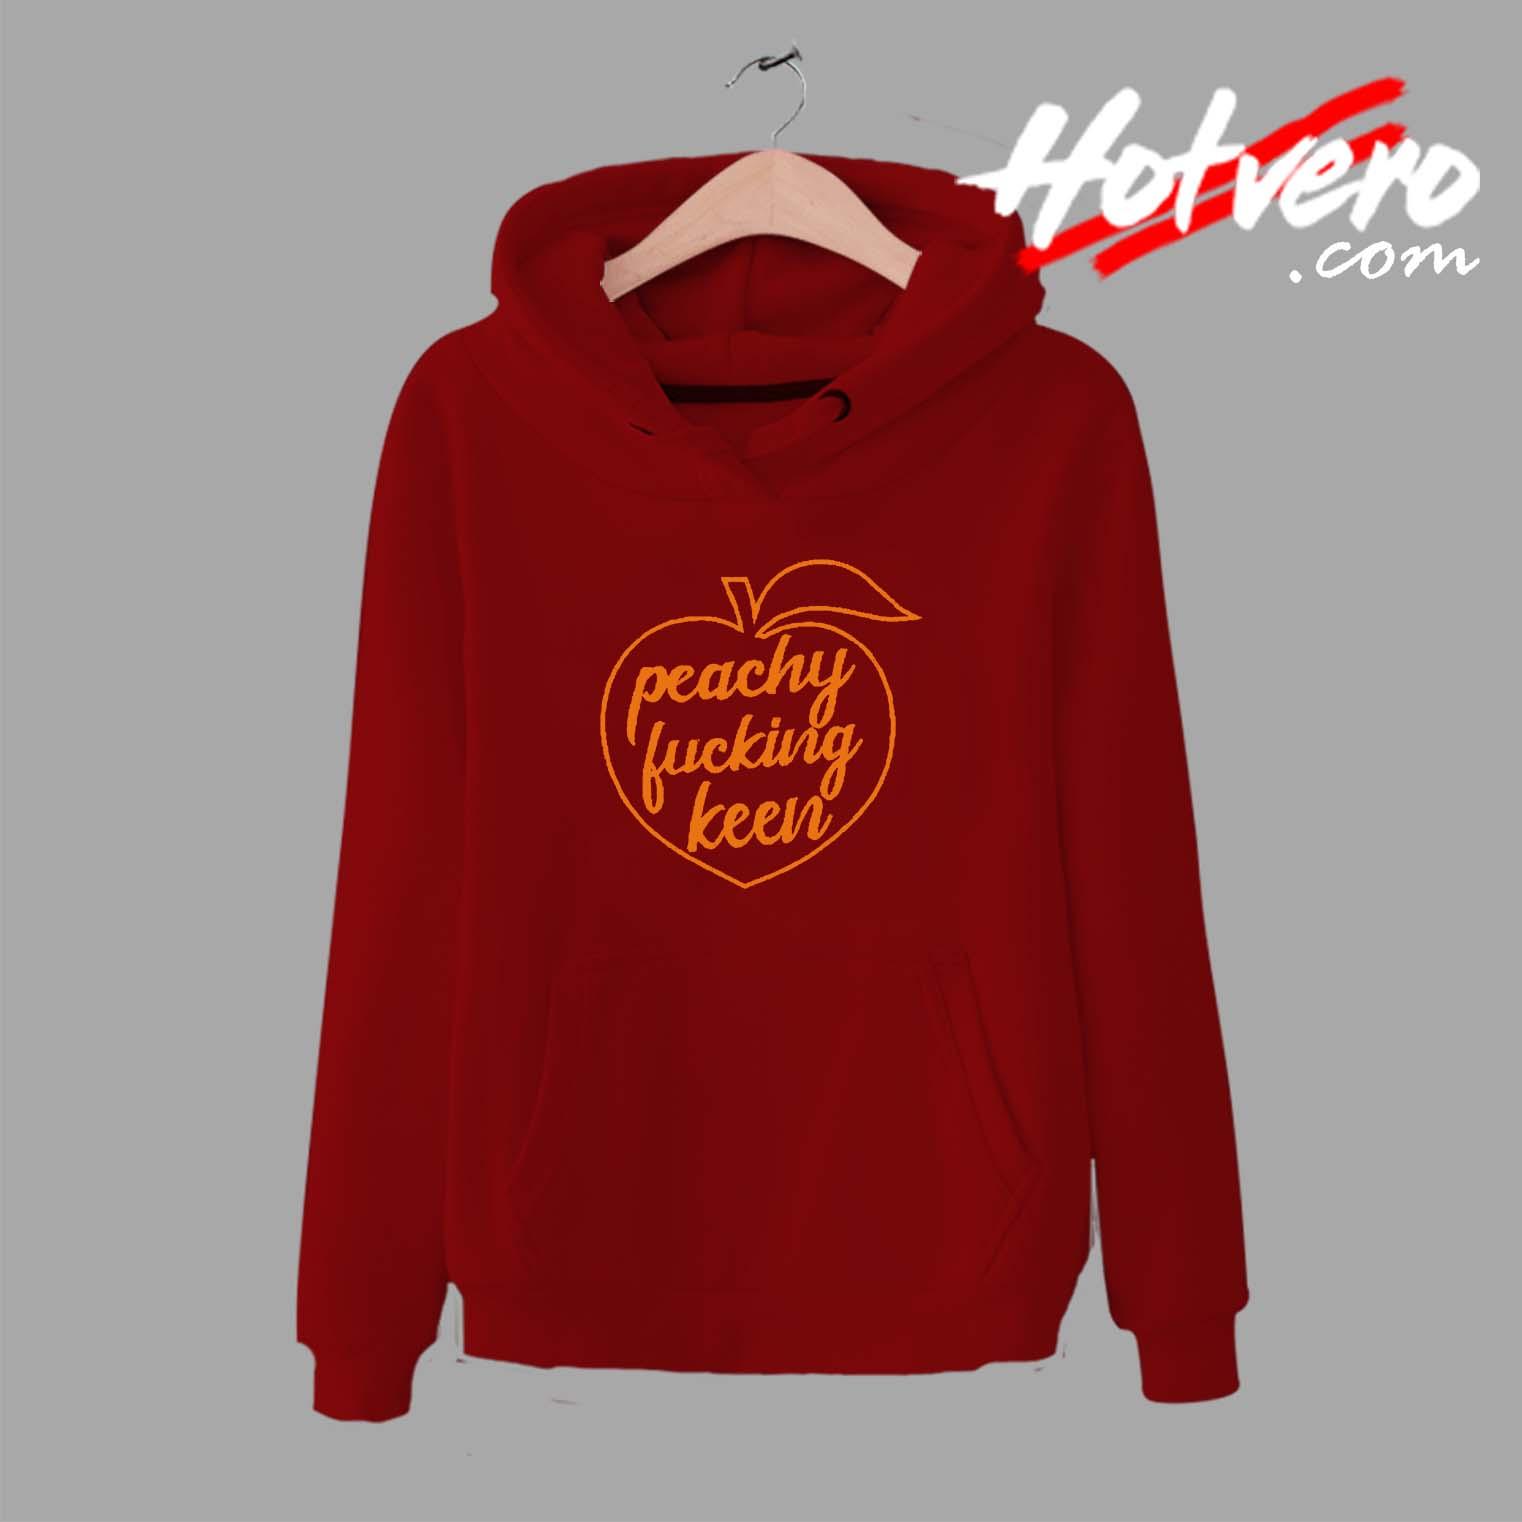 8a777a51a564 Peachy Fucking Keen Unisex Hoodie - Streetwear by Hotvero